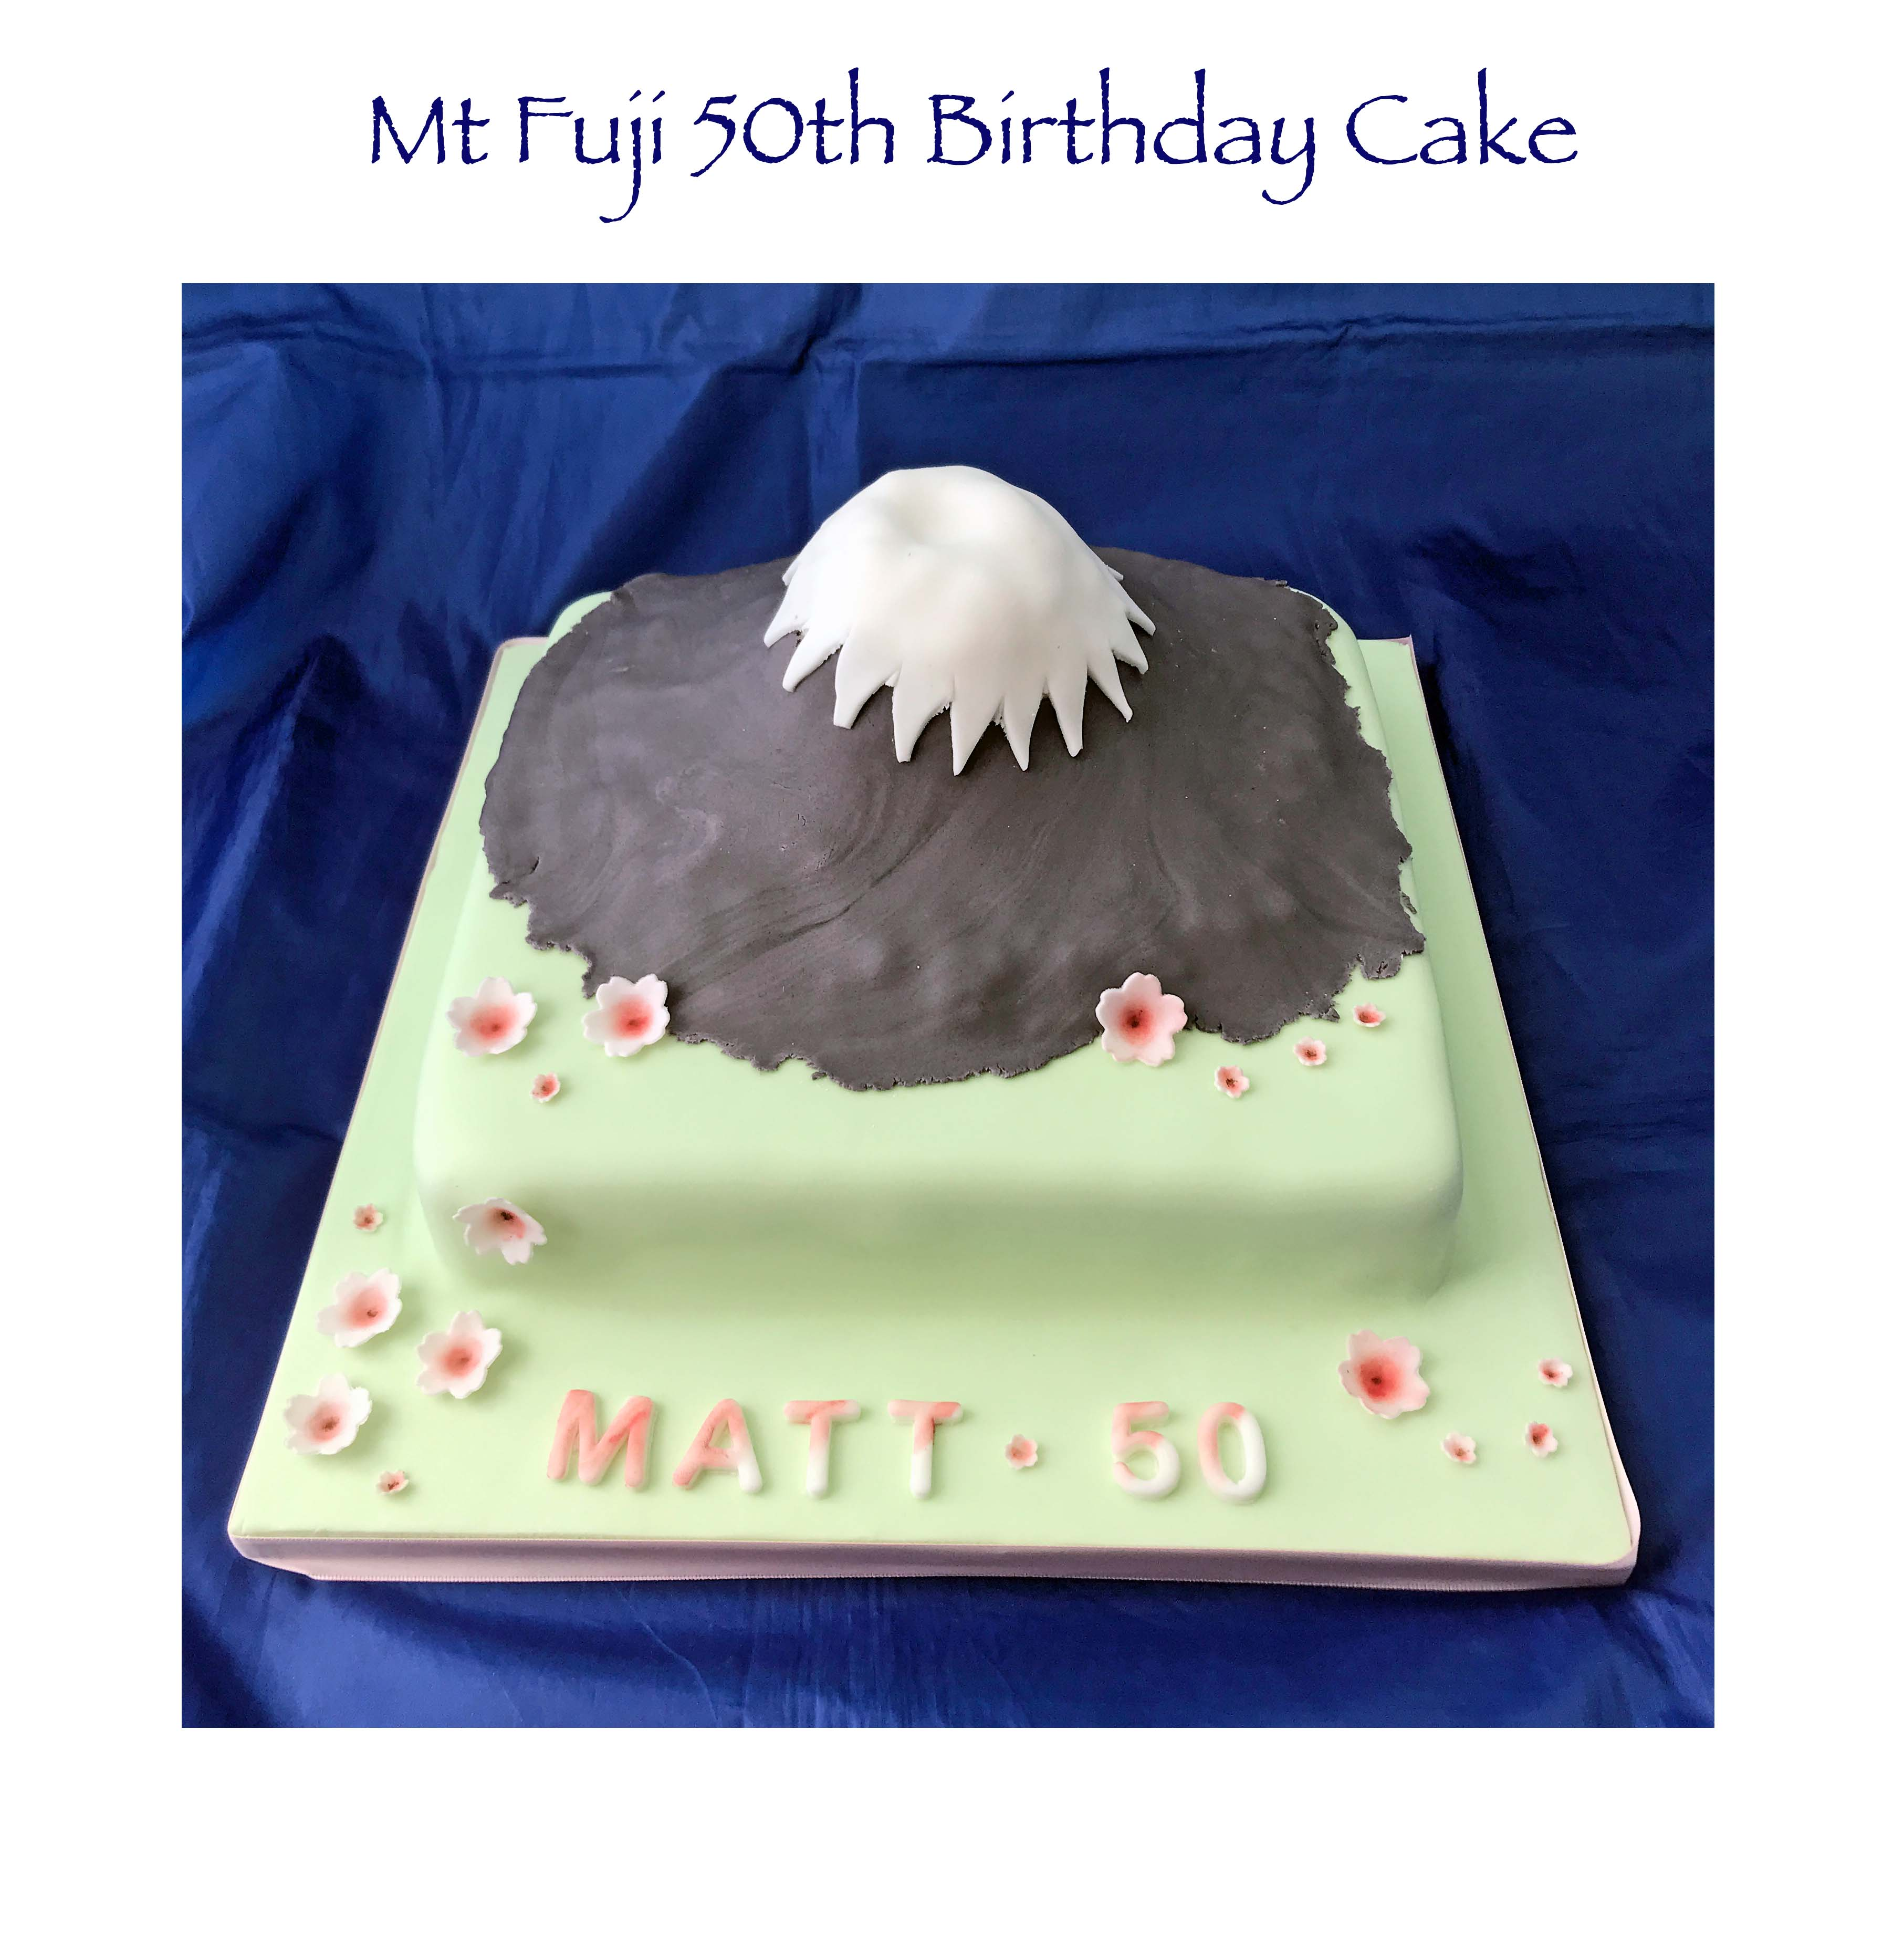 Mt Fuji Cake